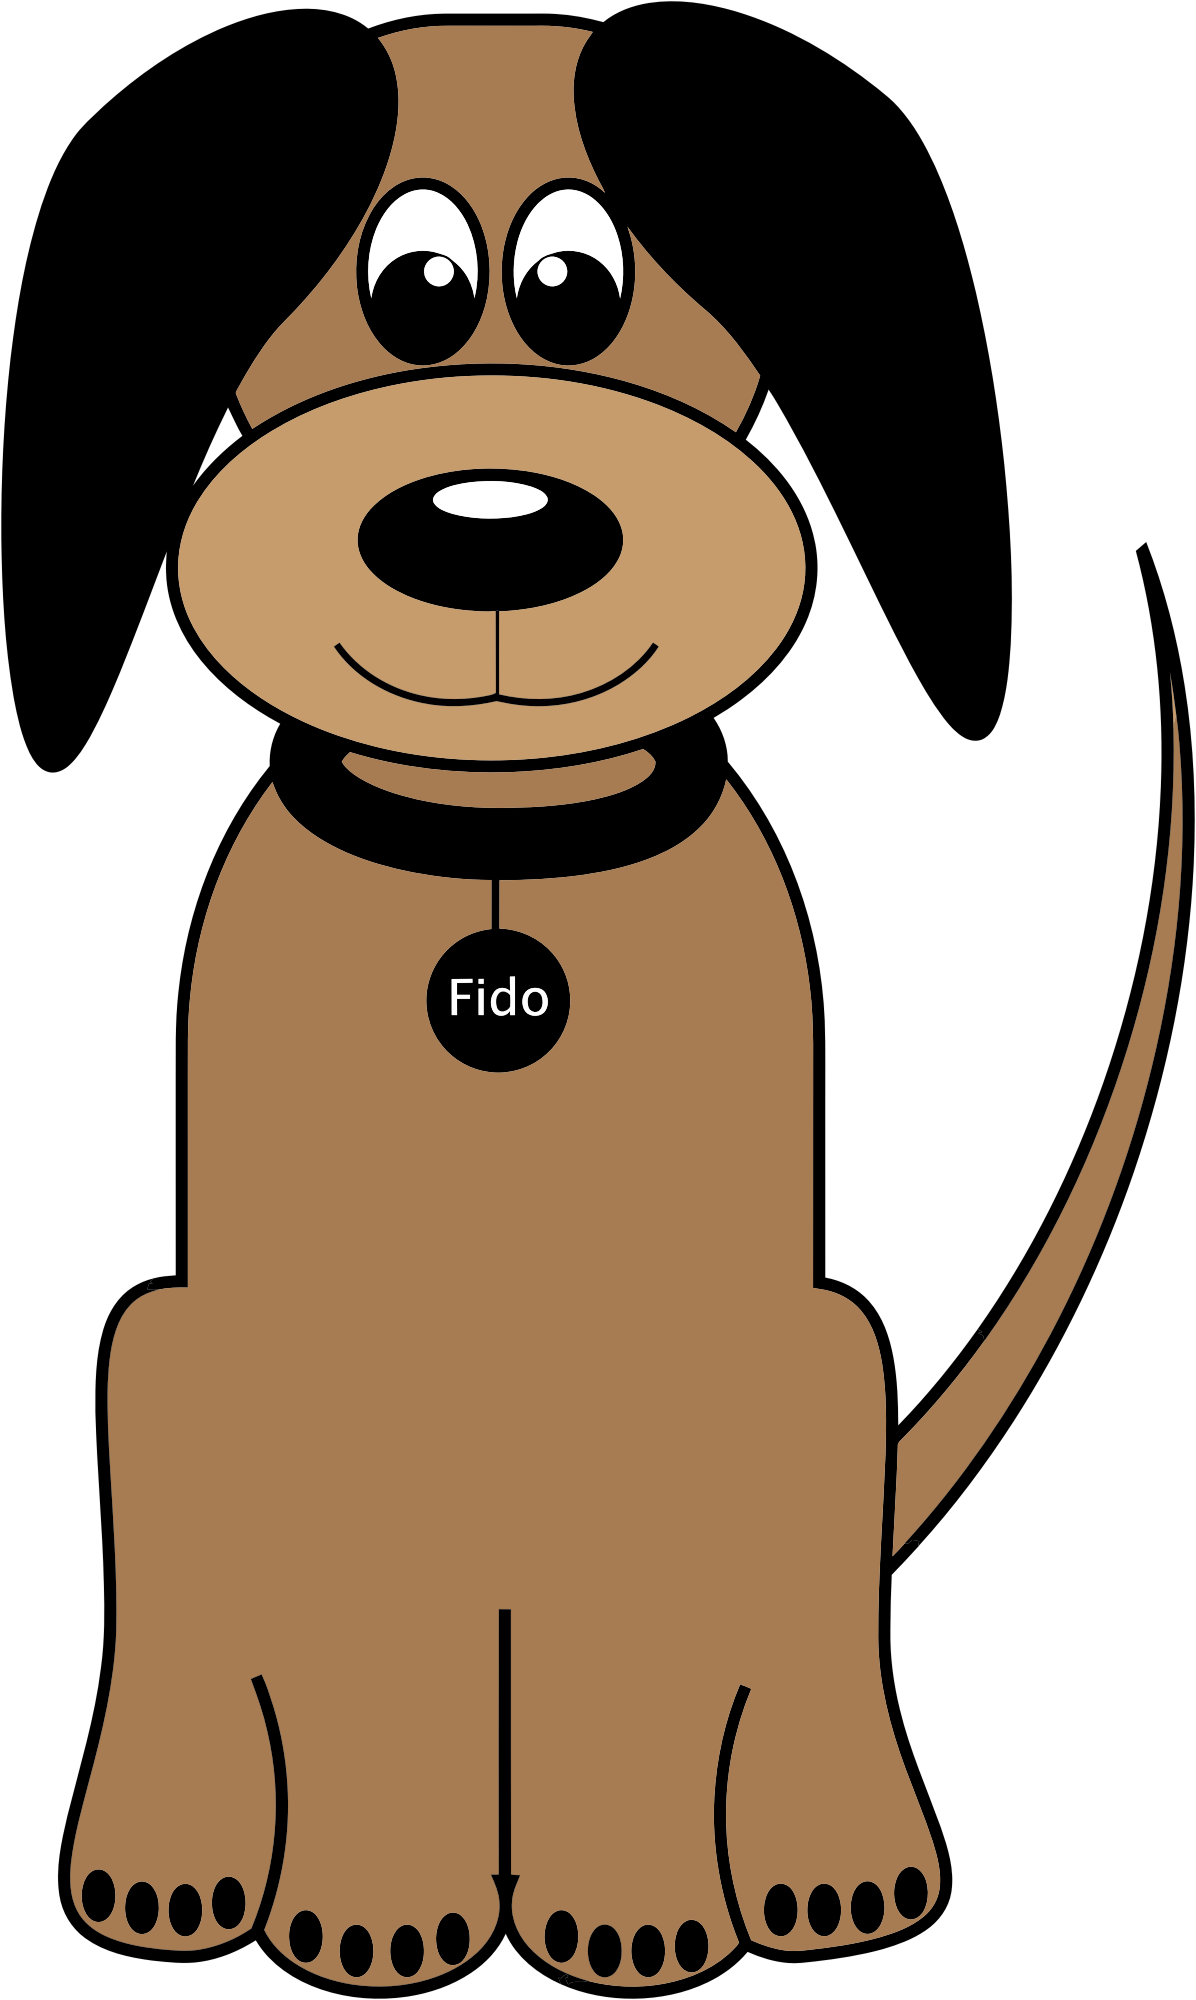 Cartoon fido image png. Clipart big dog